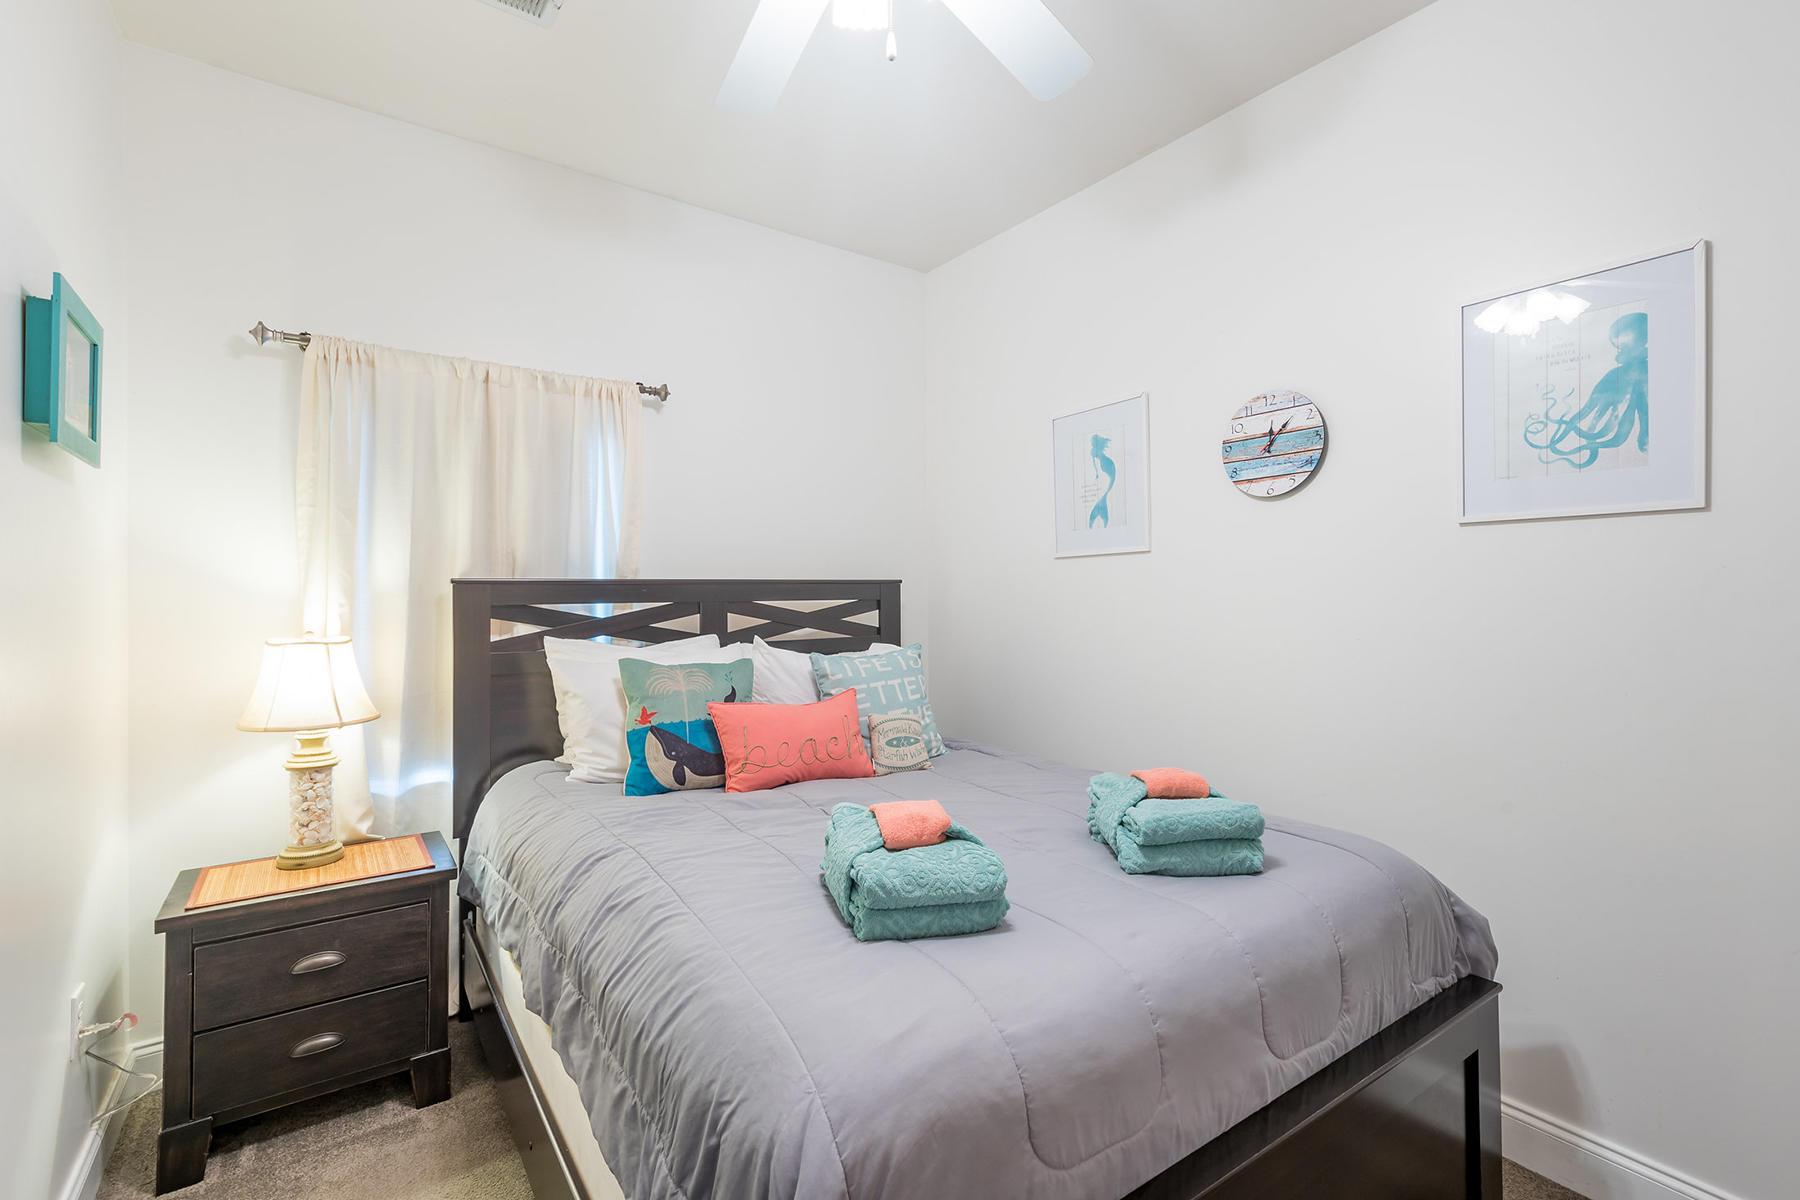 Pier Pointe Villas Homes For Sale - 114 Ashley, Folly Beach, SC - 14